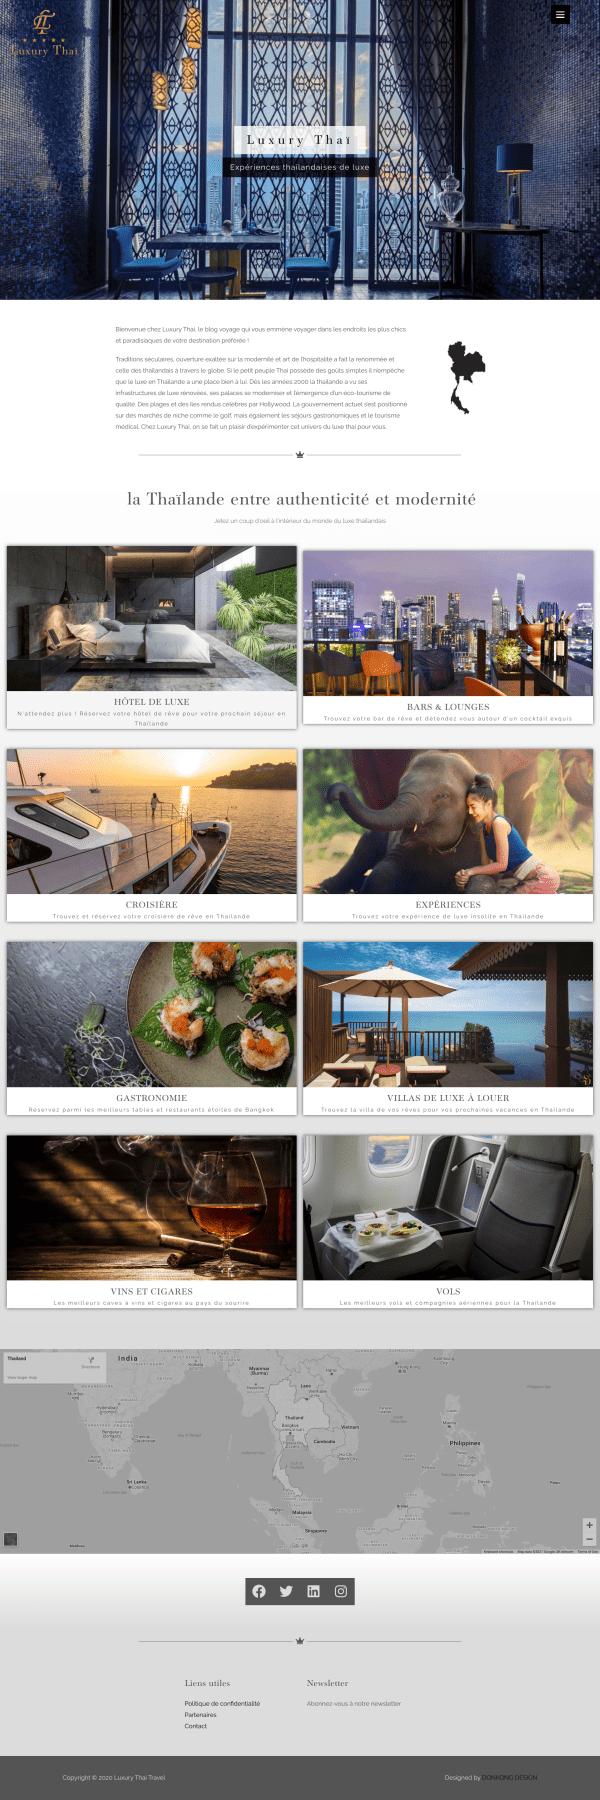 WordPress web design and development for professional travel websites.